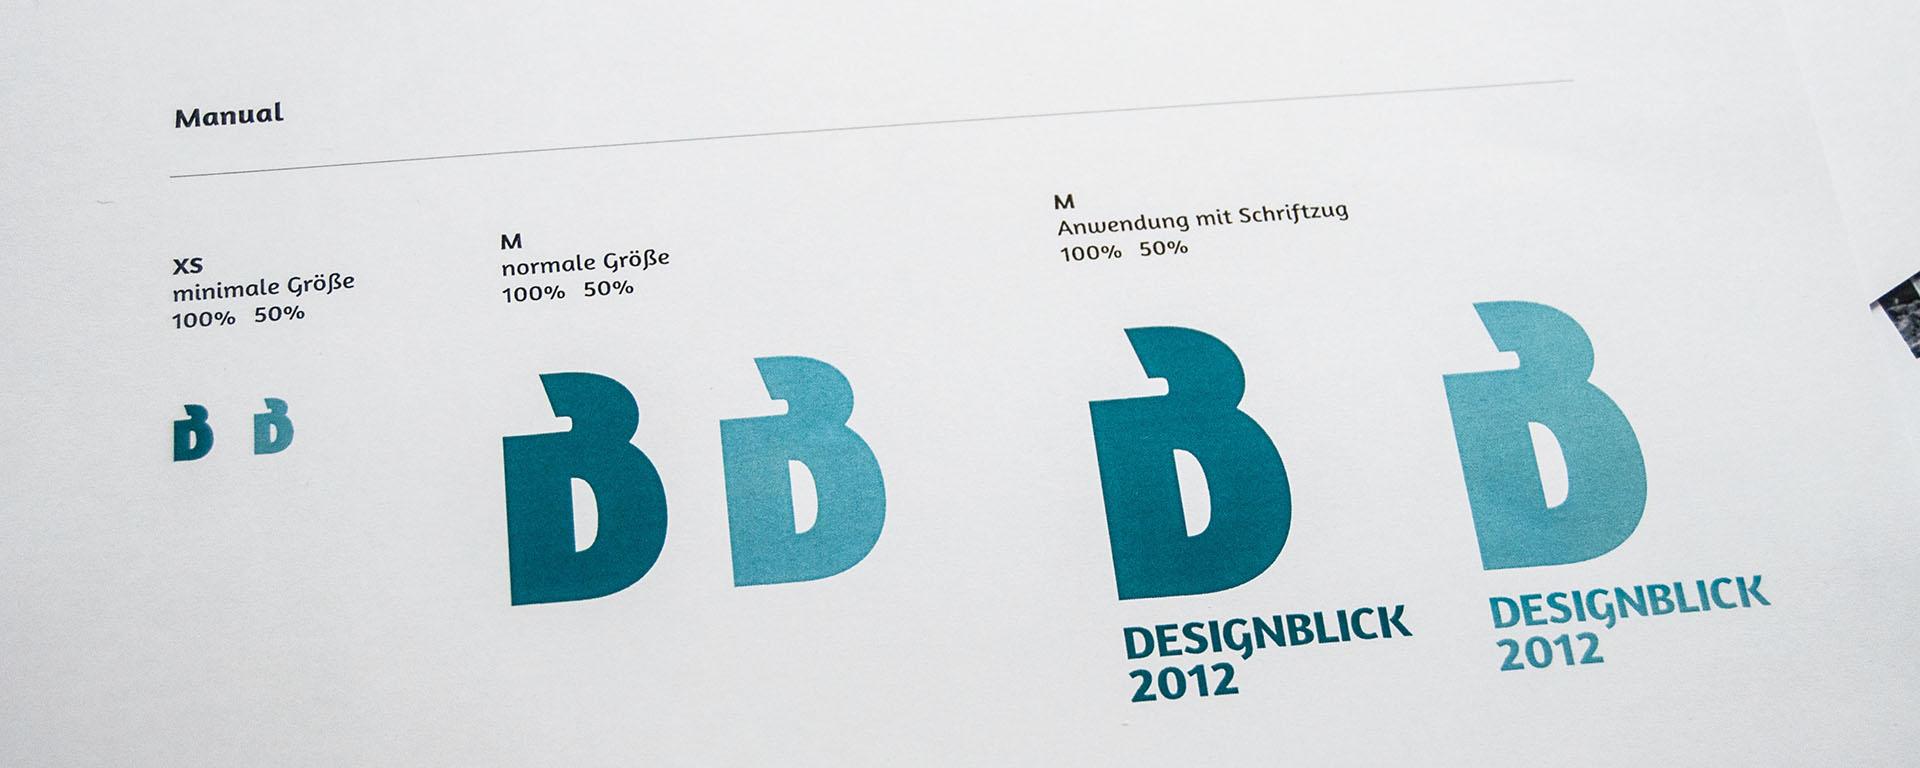 Designblick 2012